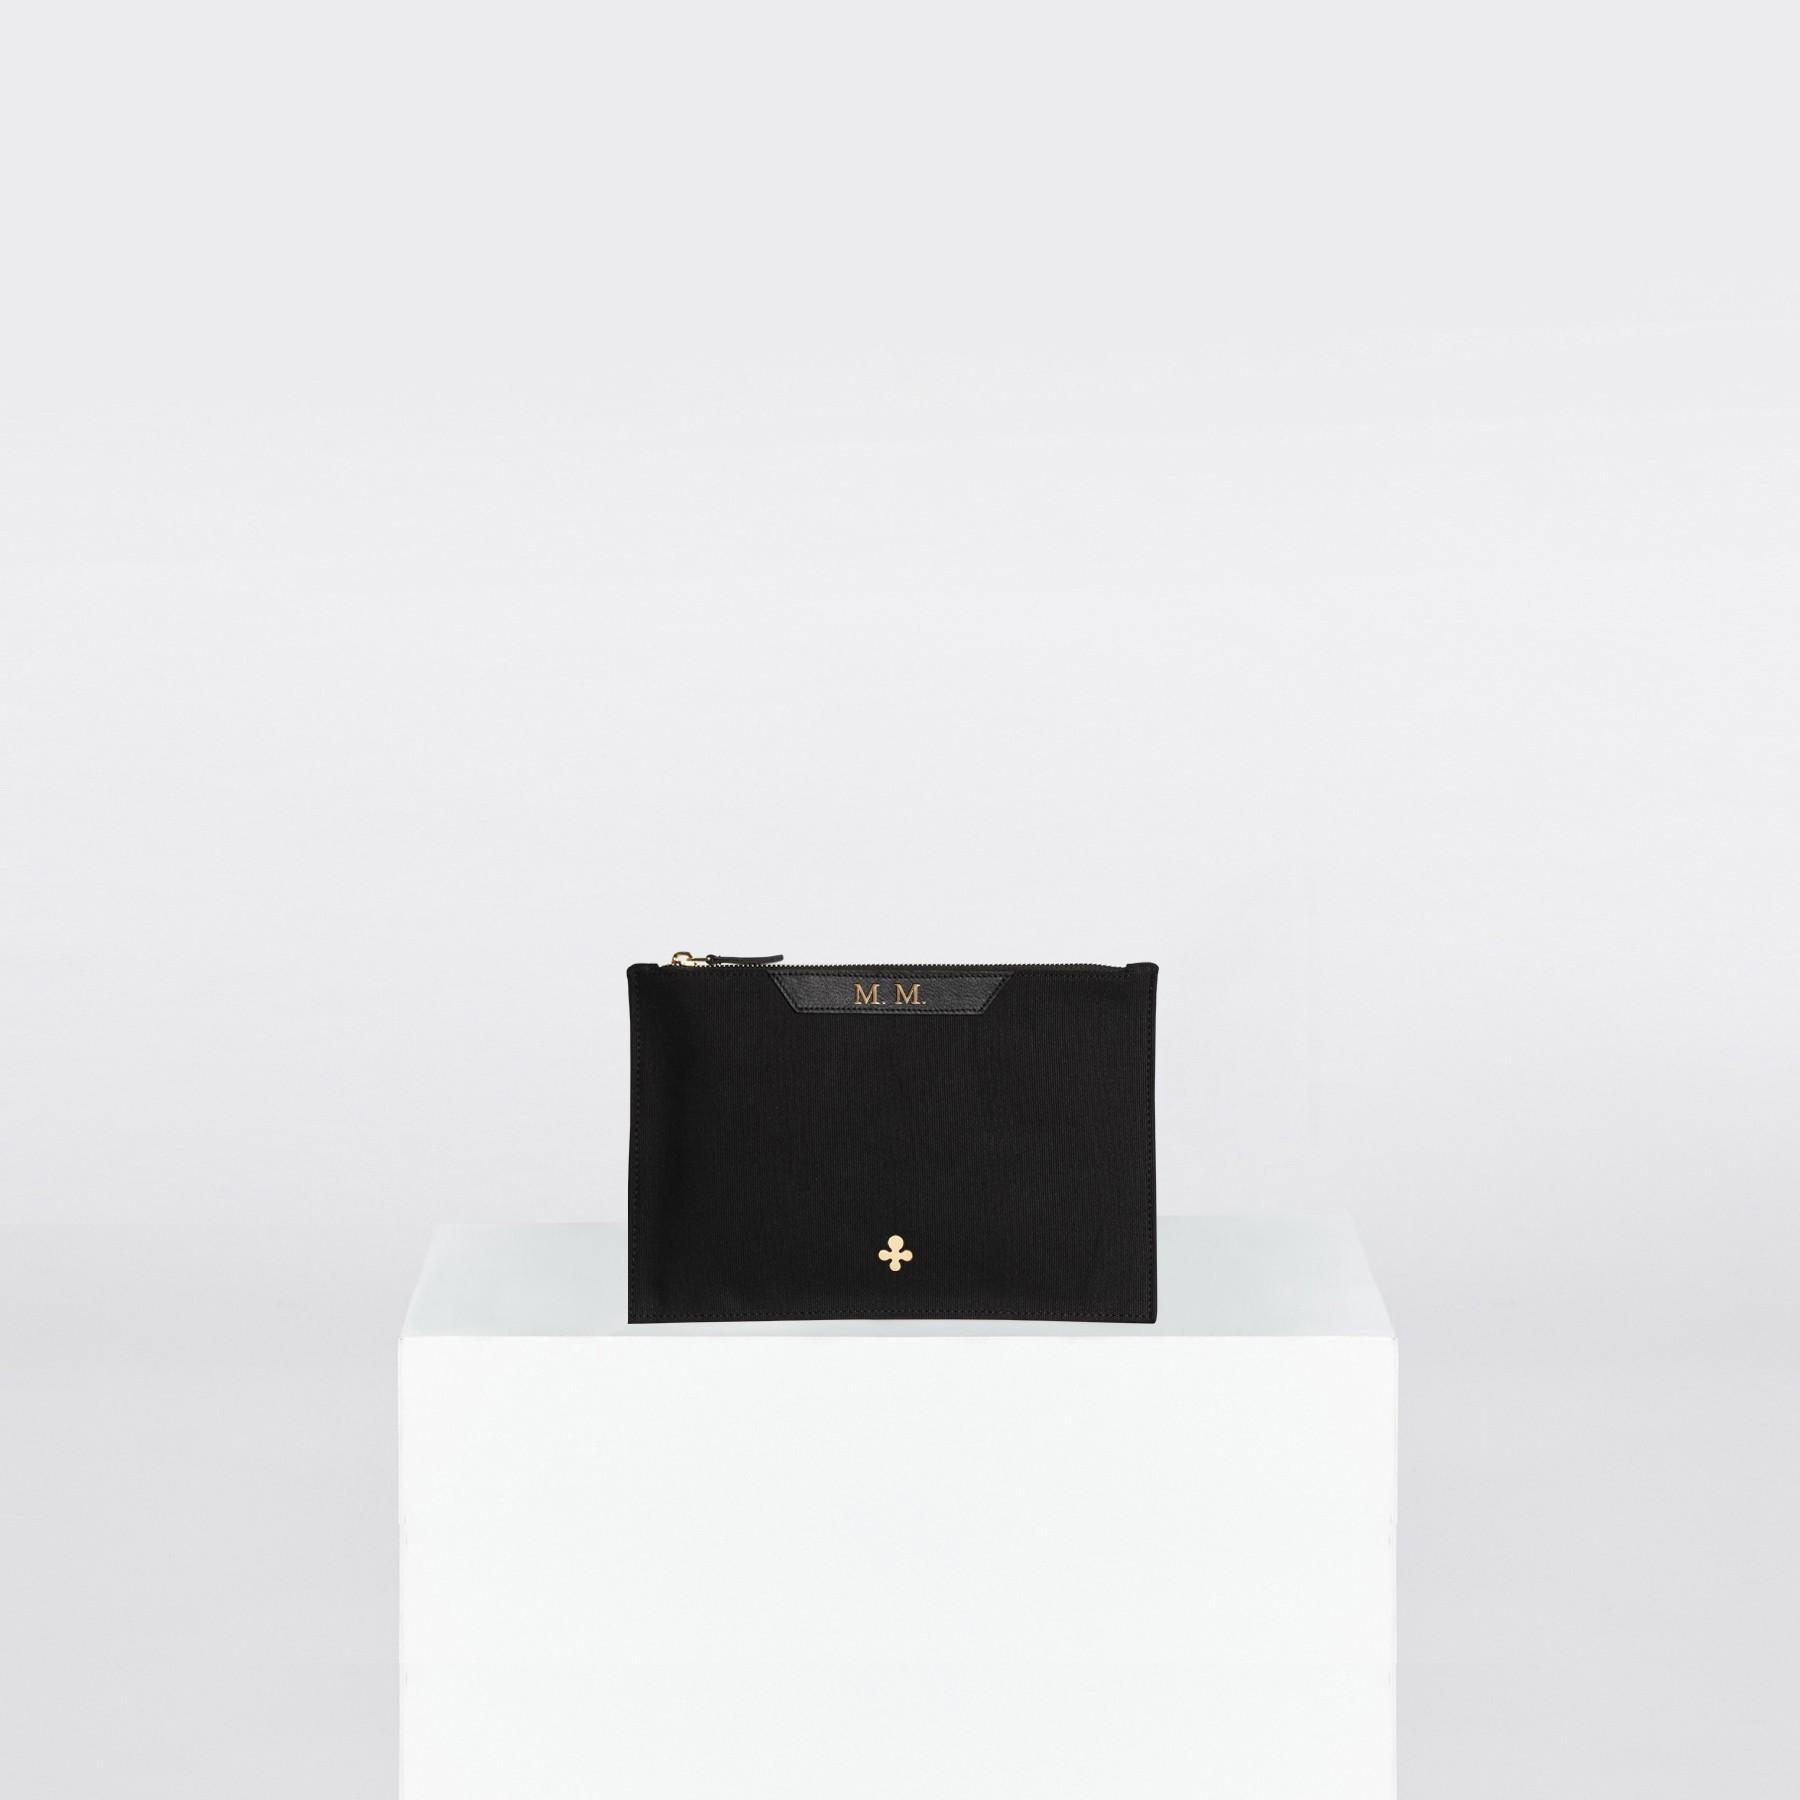 Pochette, toile noire